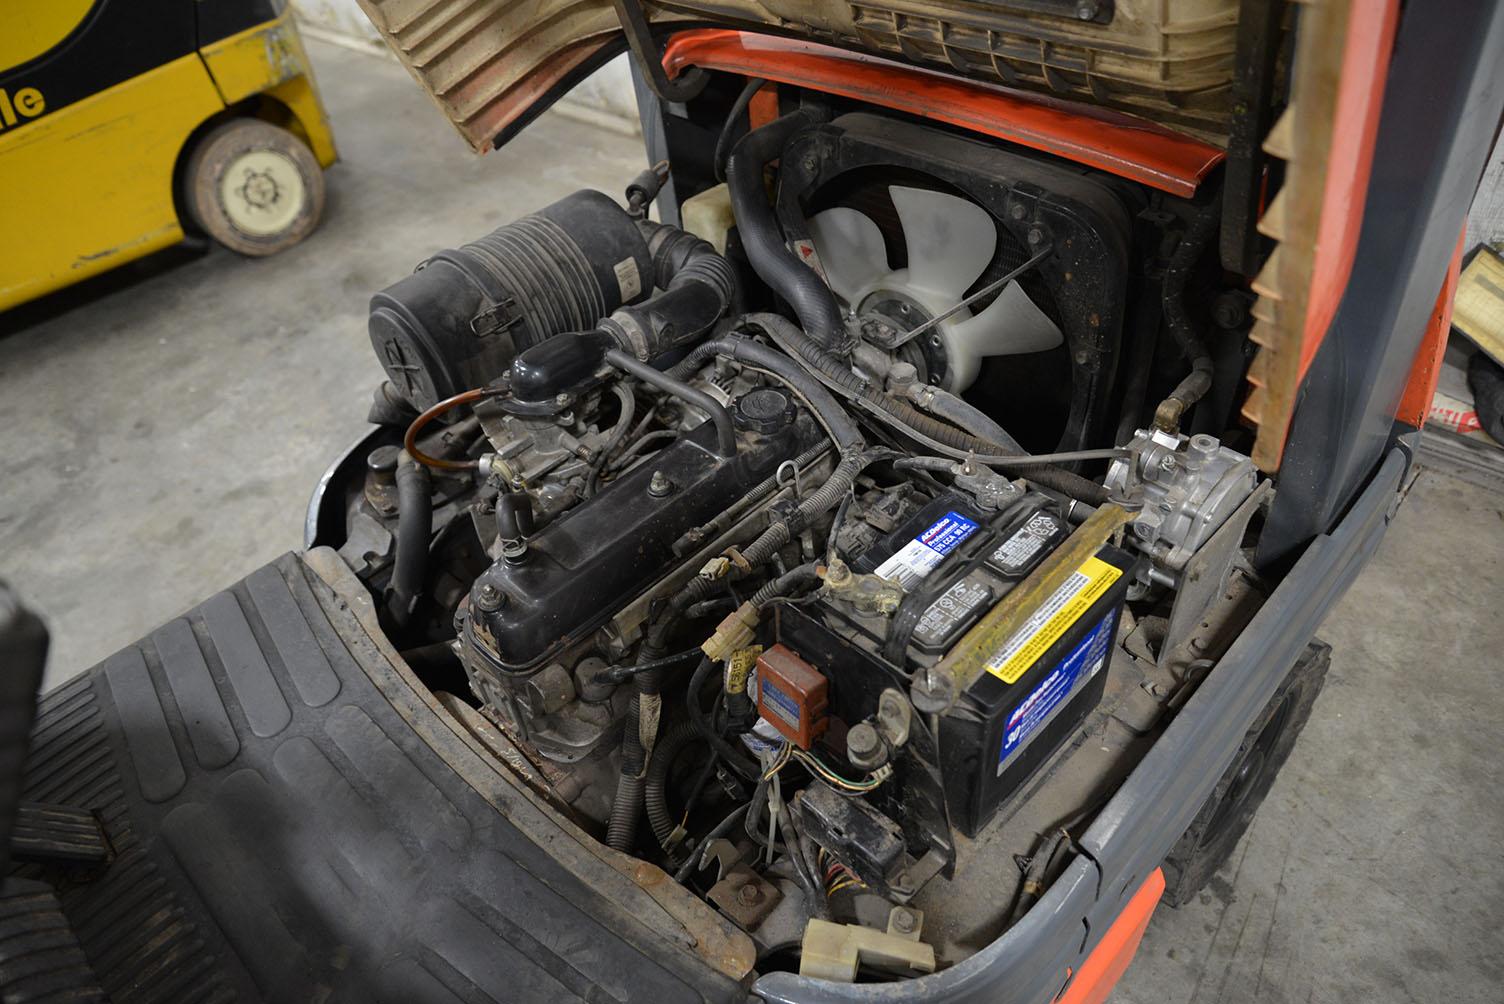 Toyota Forklift Shift Lever Switch : Toyota lb capacity forklift model fgu s n